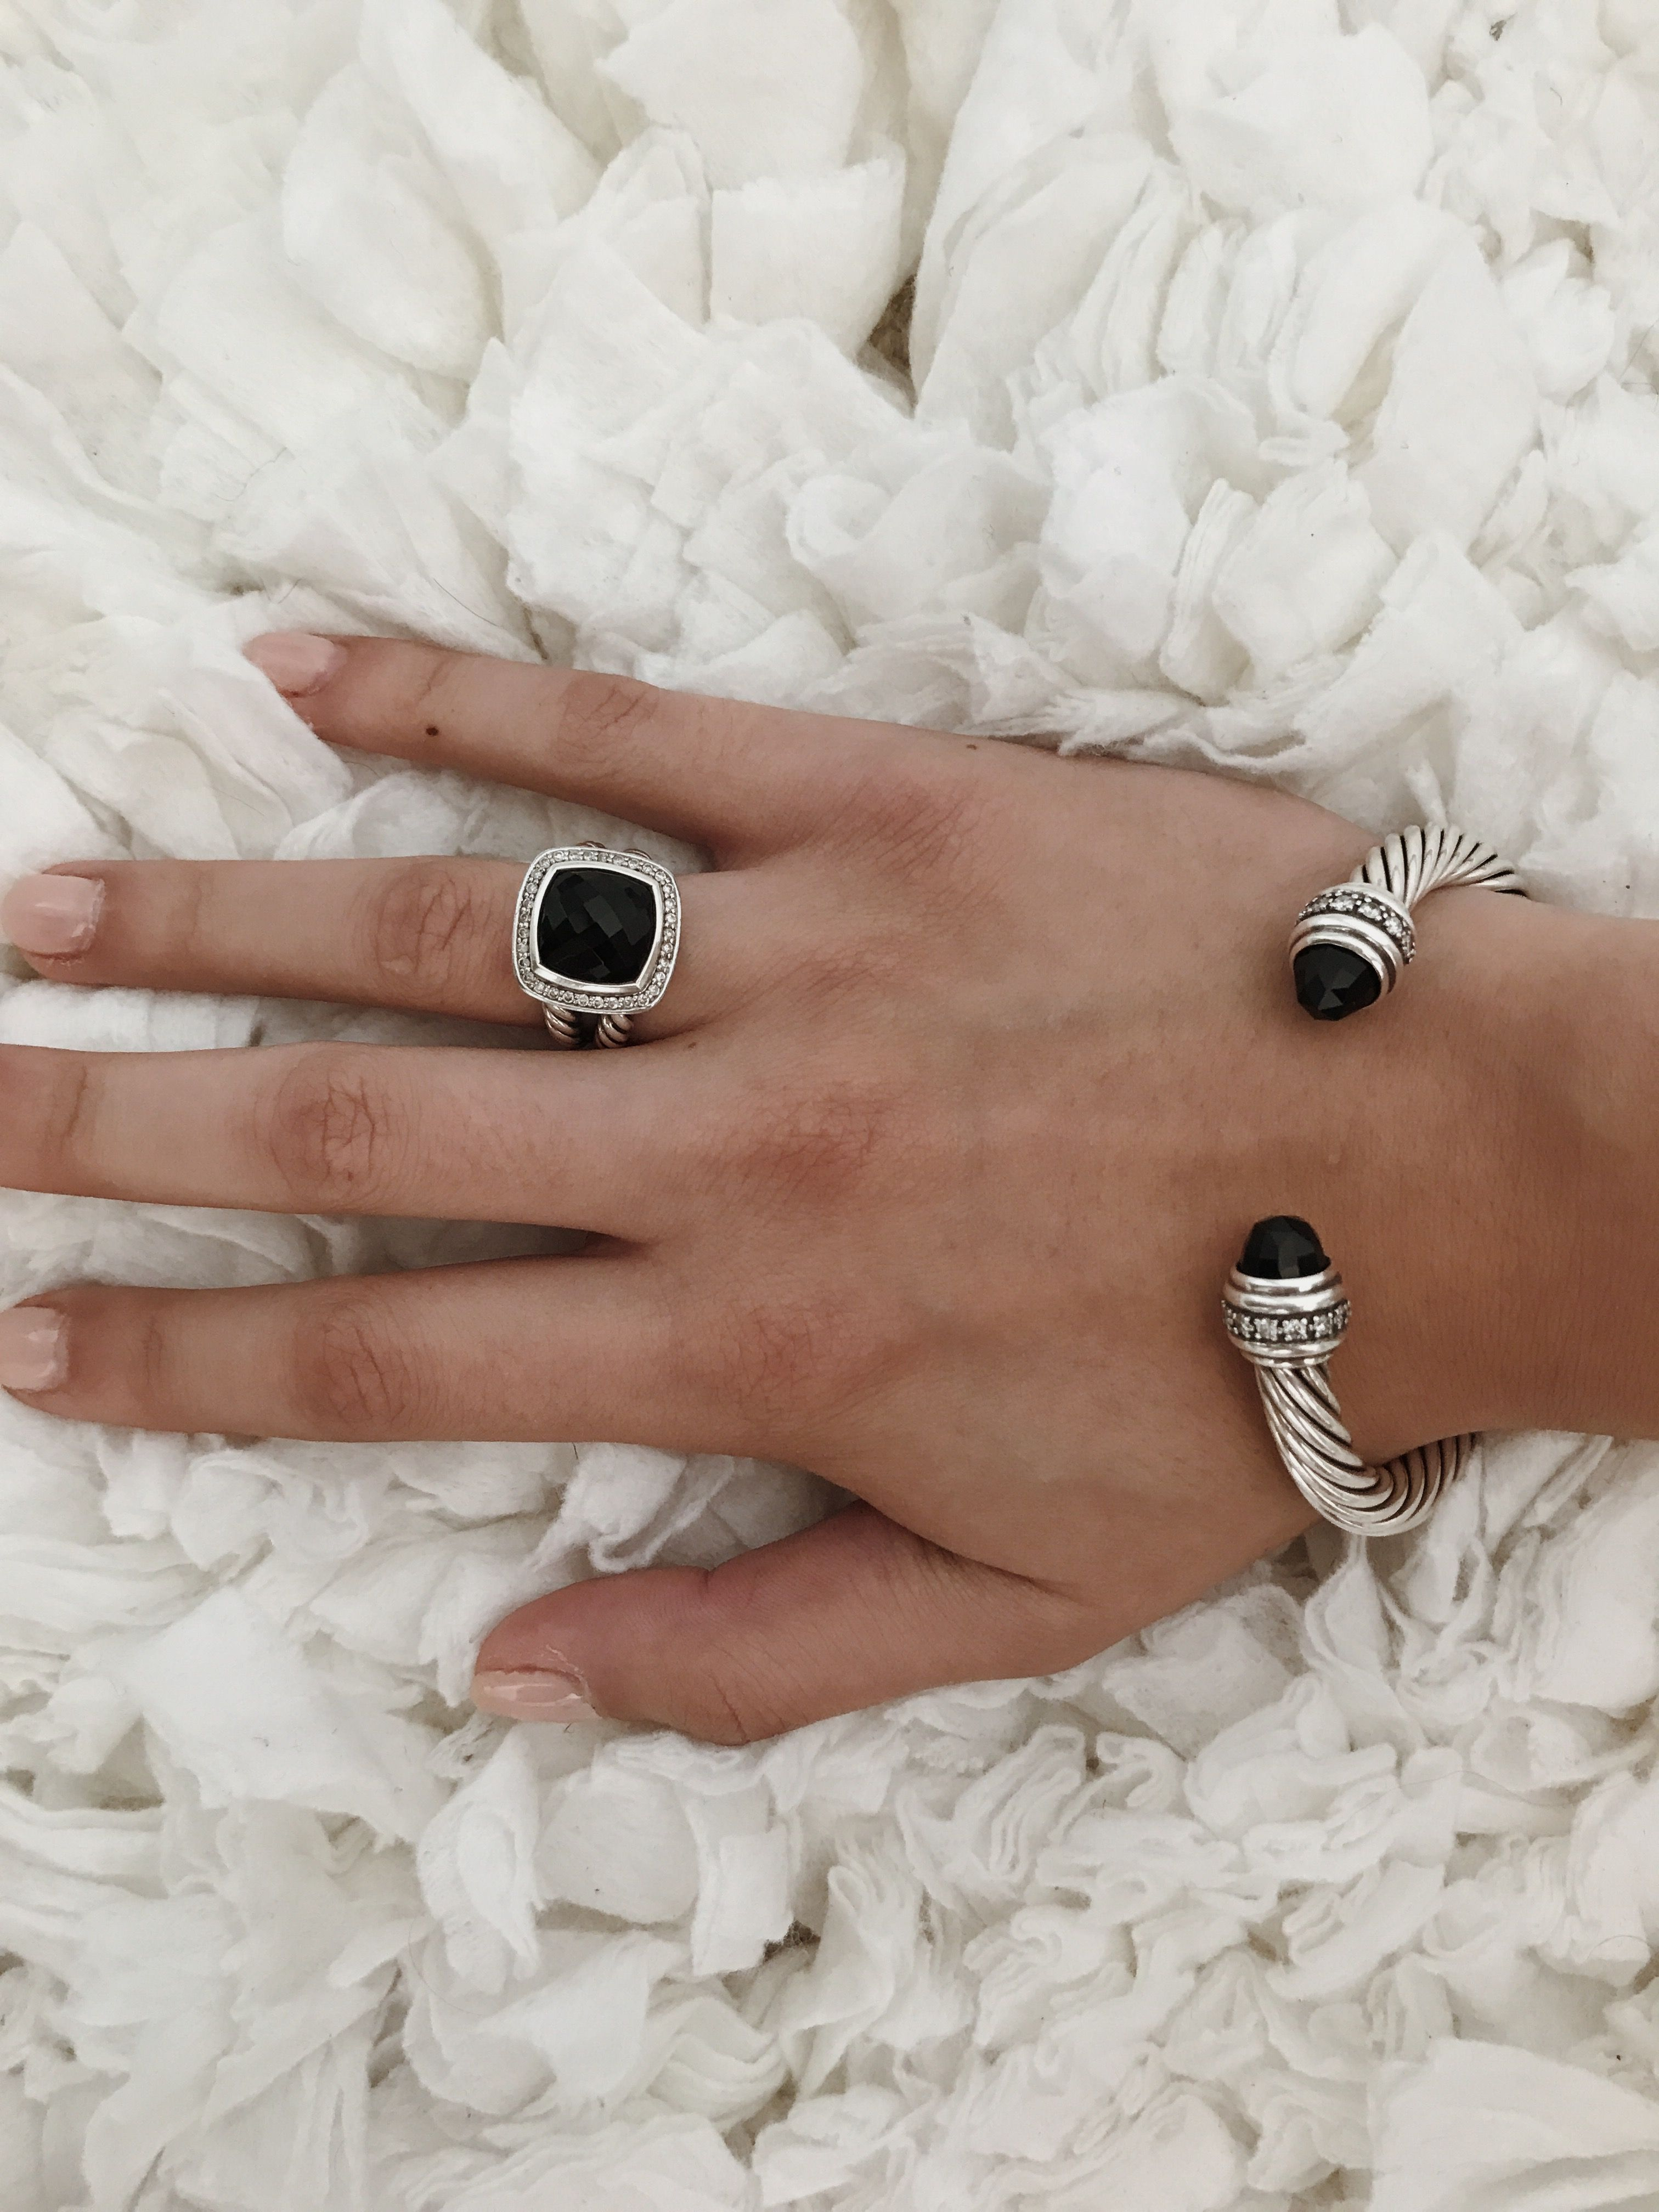 David Yurman Albion Ring With Black Onyx Diamonds 11mm Cable Classic Bracelet Black David Yurman Ring Black David Yurman Cable Bracelet David Yurman Jewelry